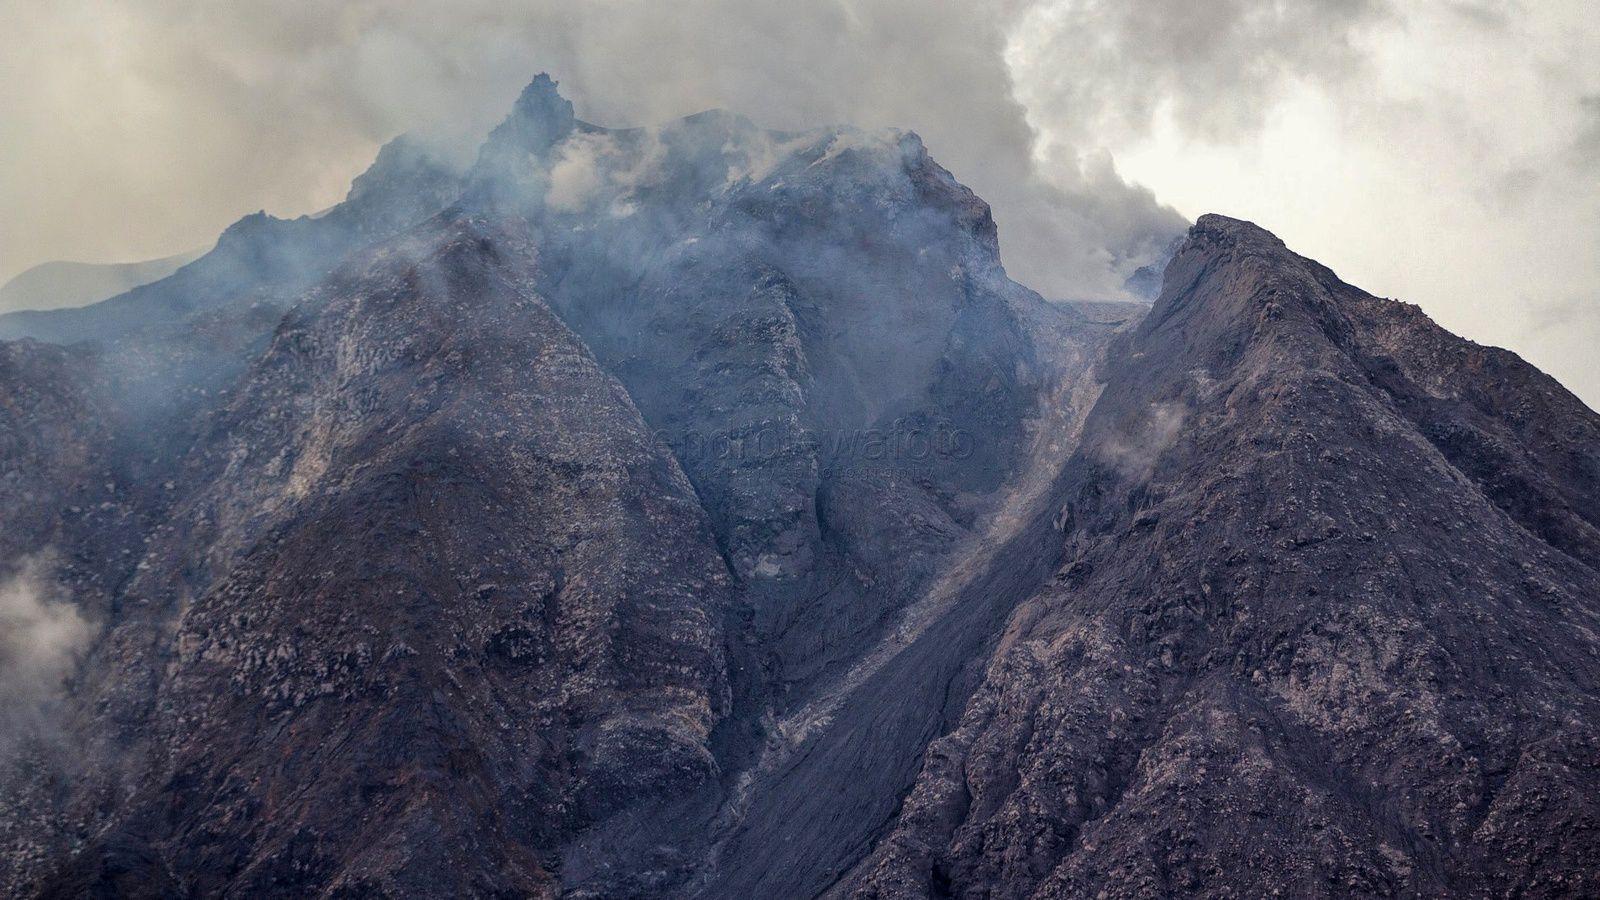 Sinabung - 25.02.2018 / 9h31 et 16h53 loc.  - photos Endro Lewa